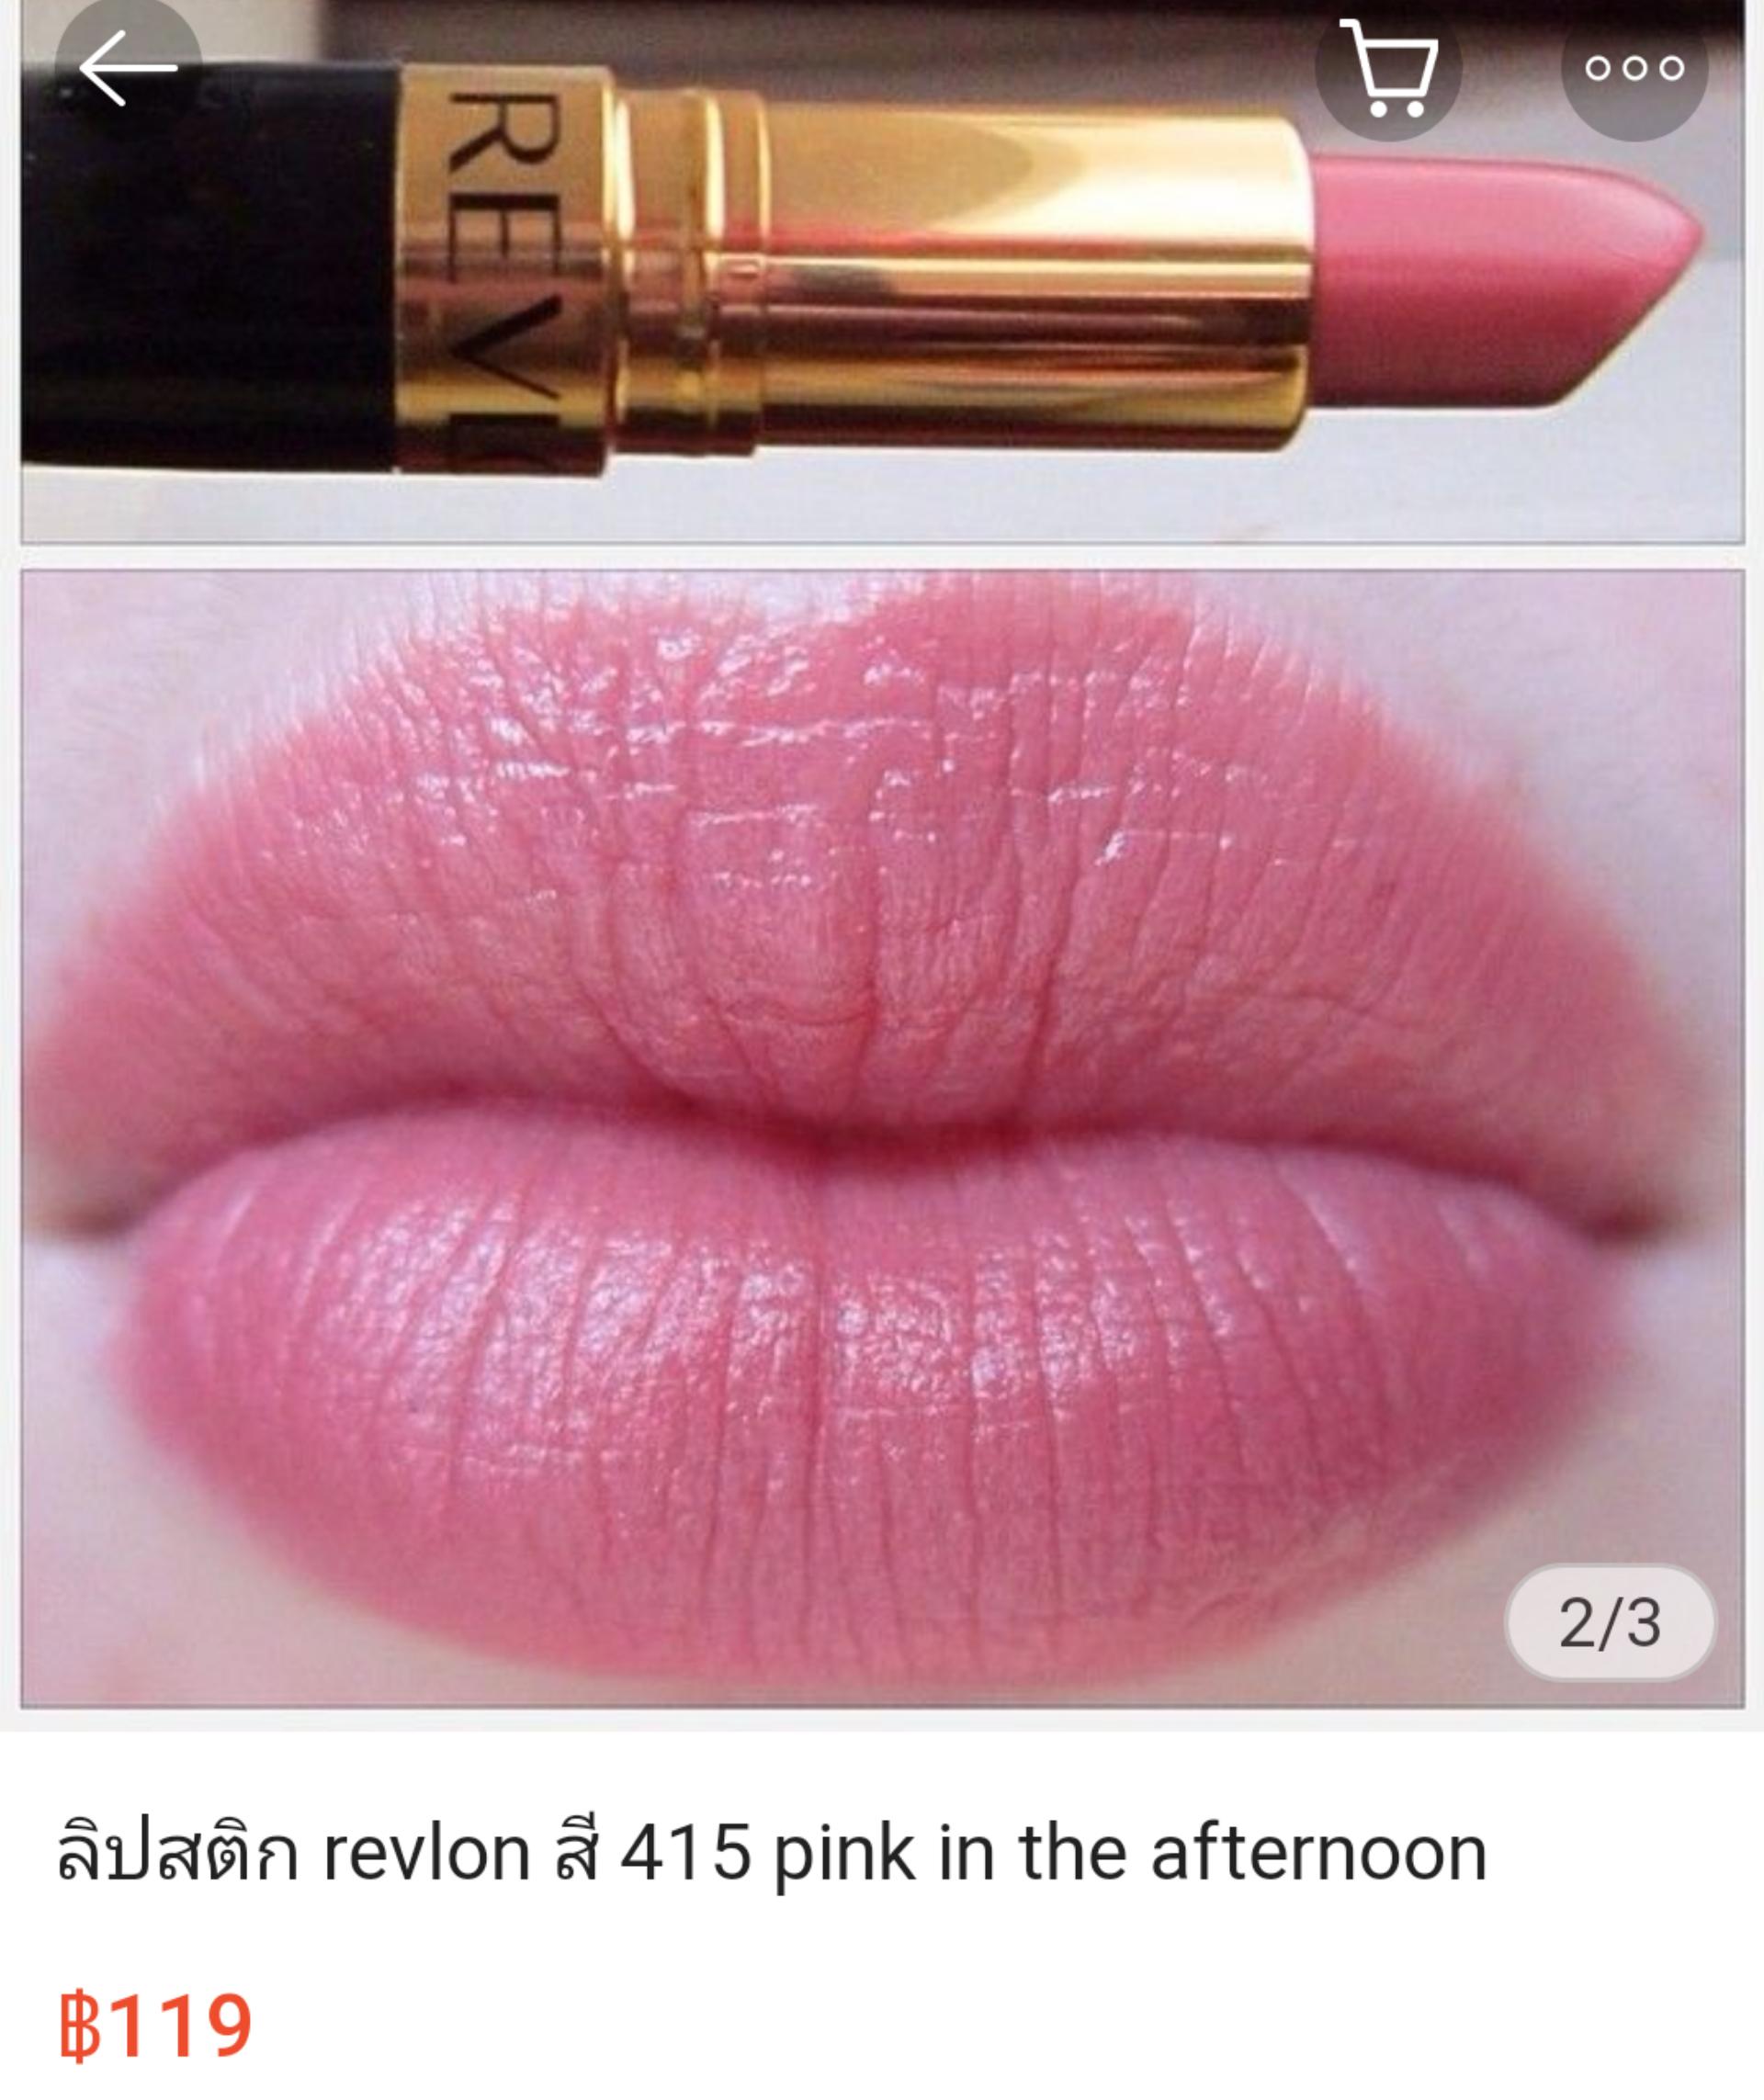 Revlon Lipstick, ลิปสติกเรฟลอน